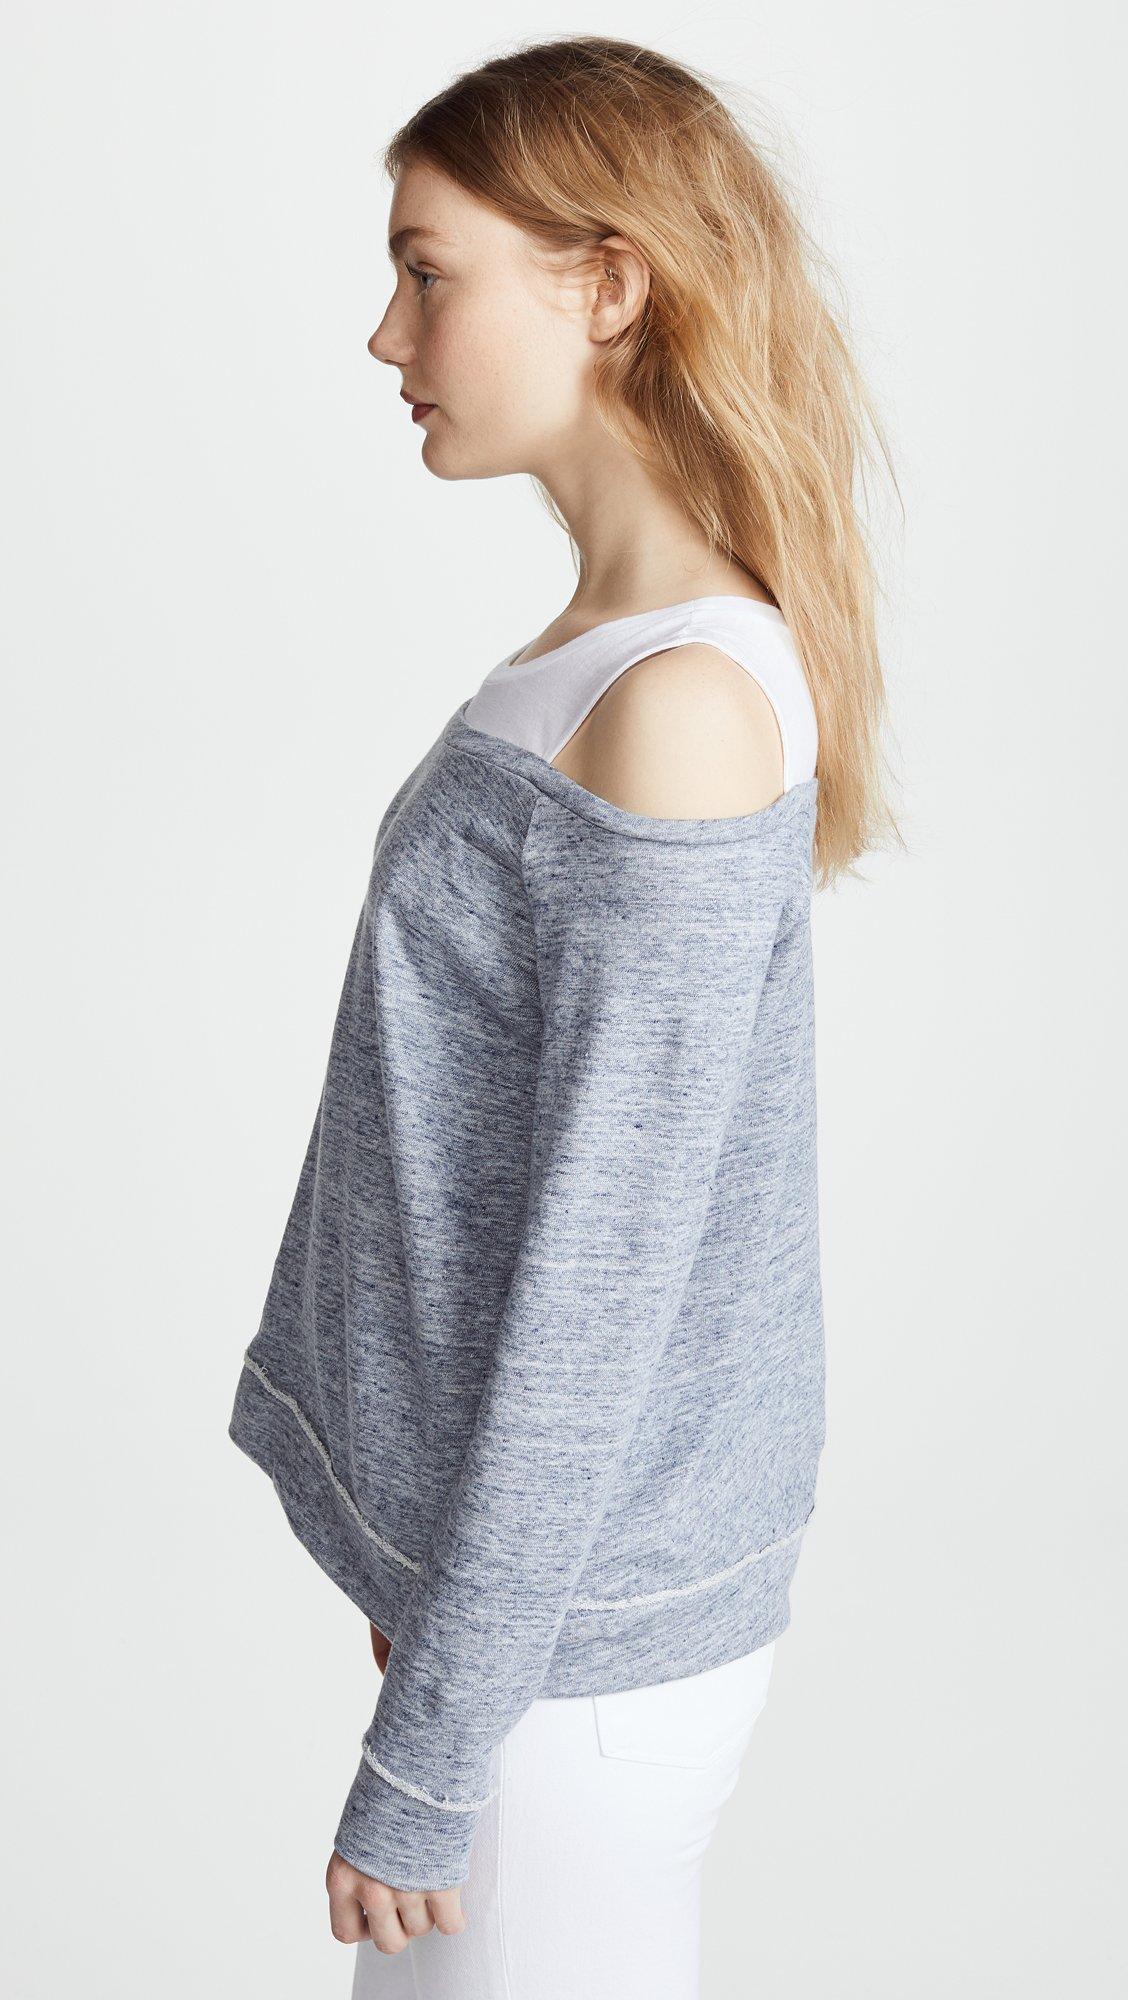 Generation Love Women's Roni Double Layered Sweatshirt, Heather Blue, Small by Generation Love (Image #4)